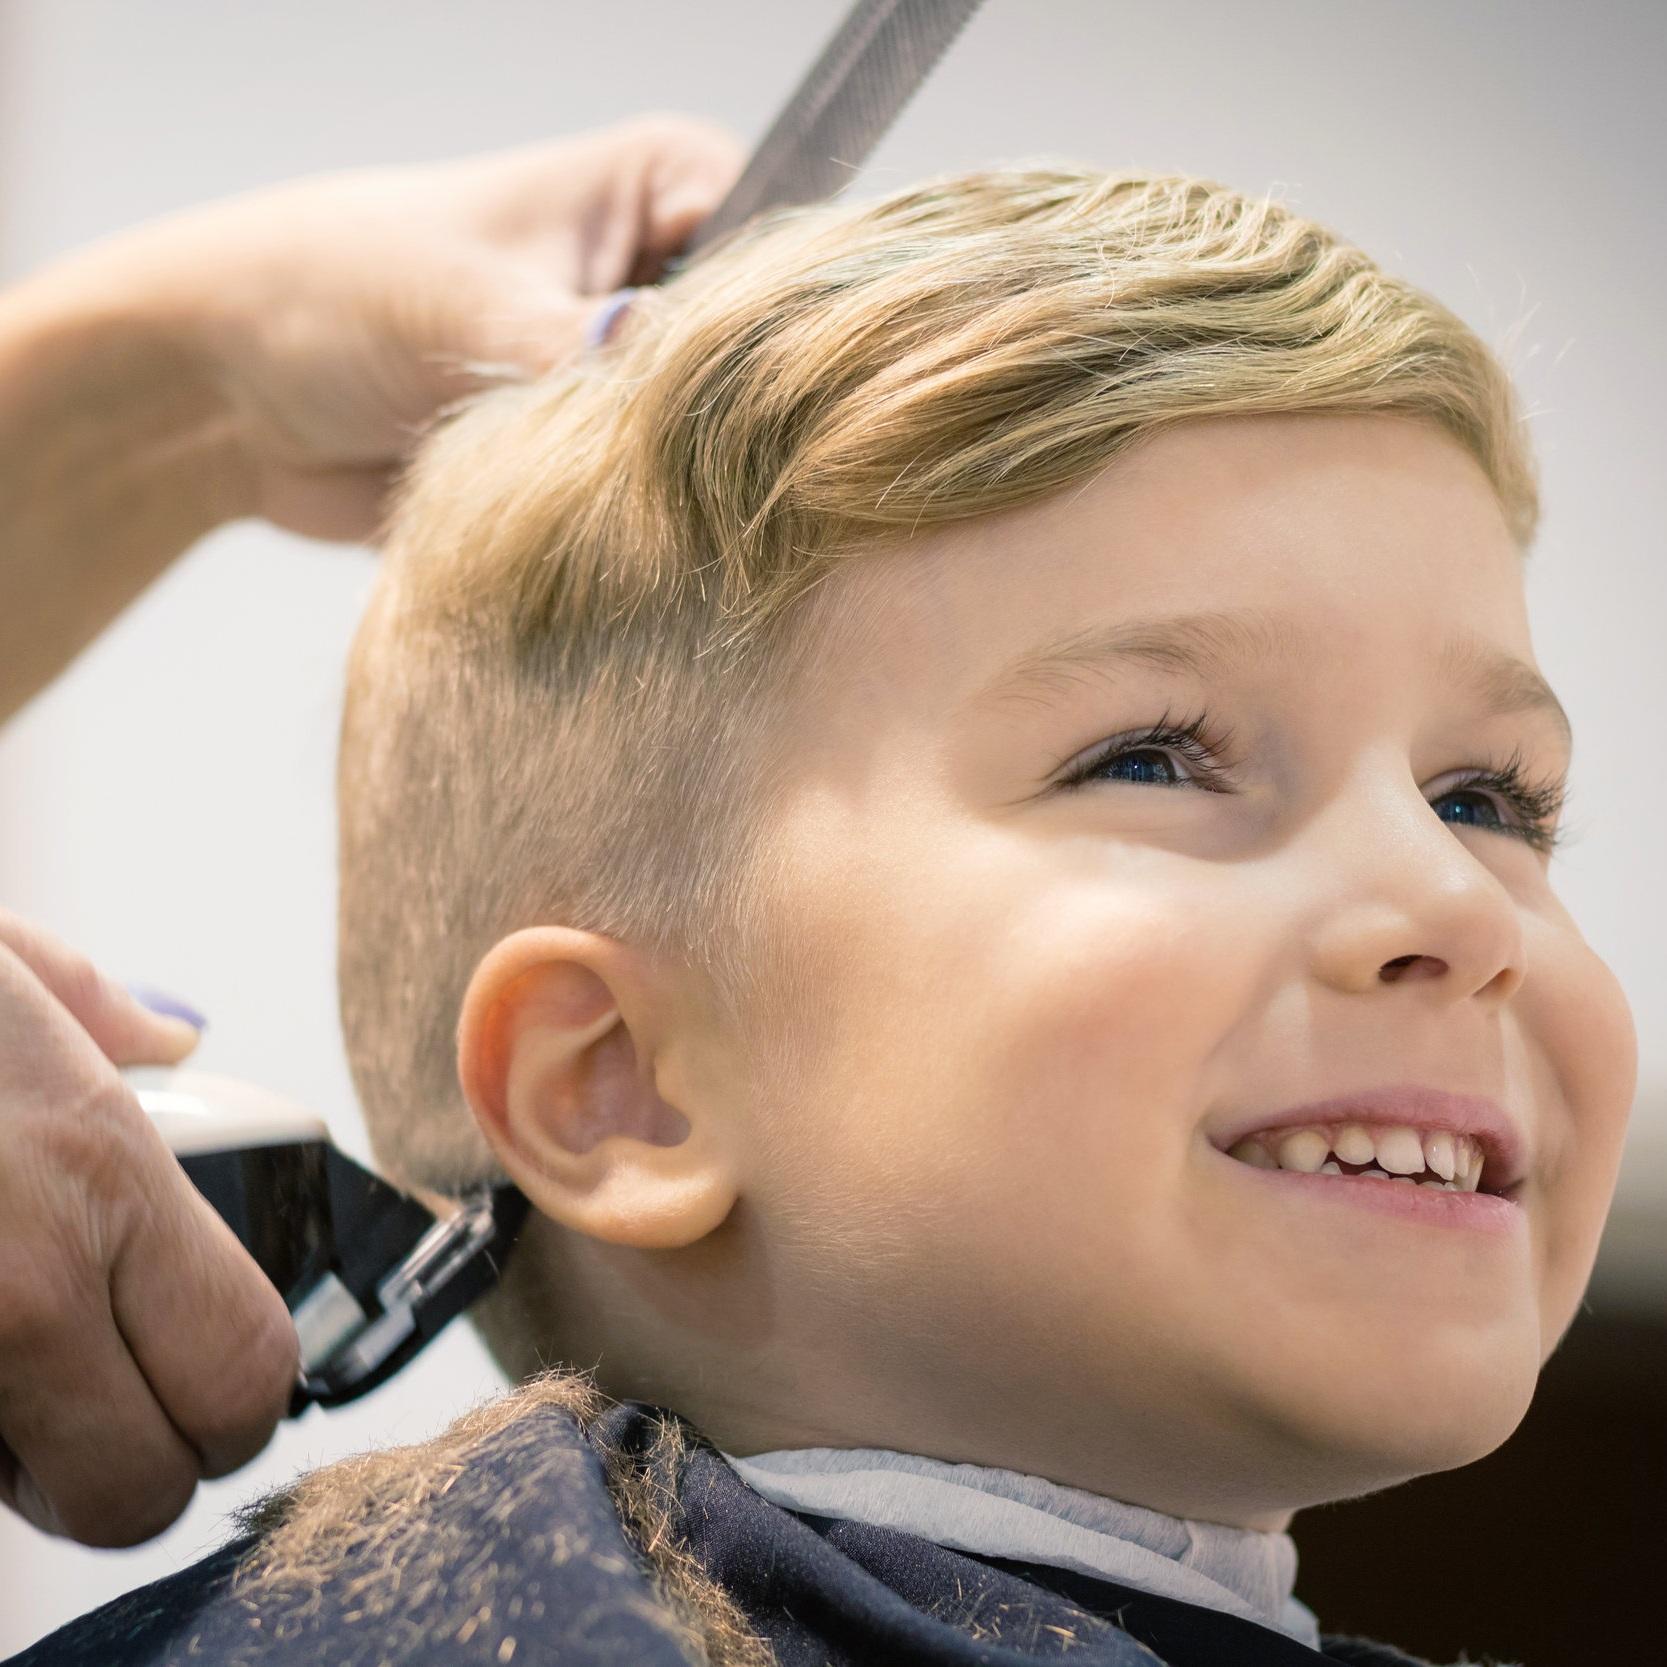 Haircuts (Men, Women, Children) -